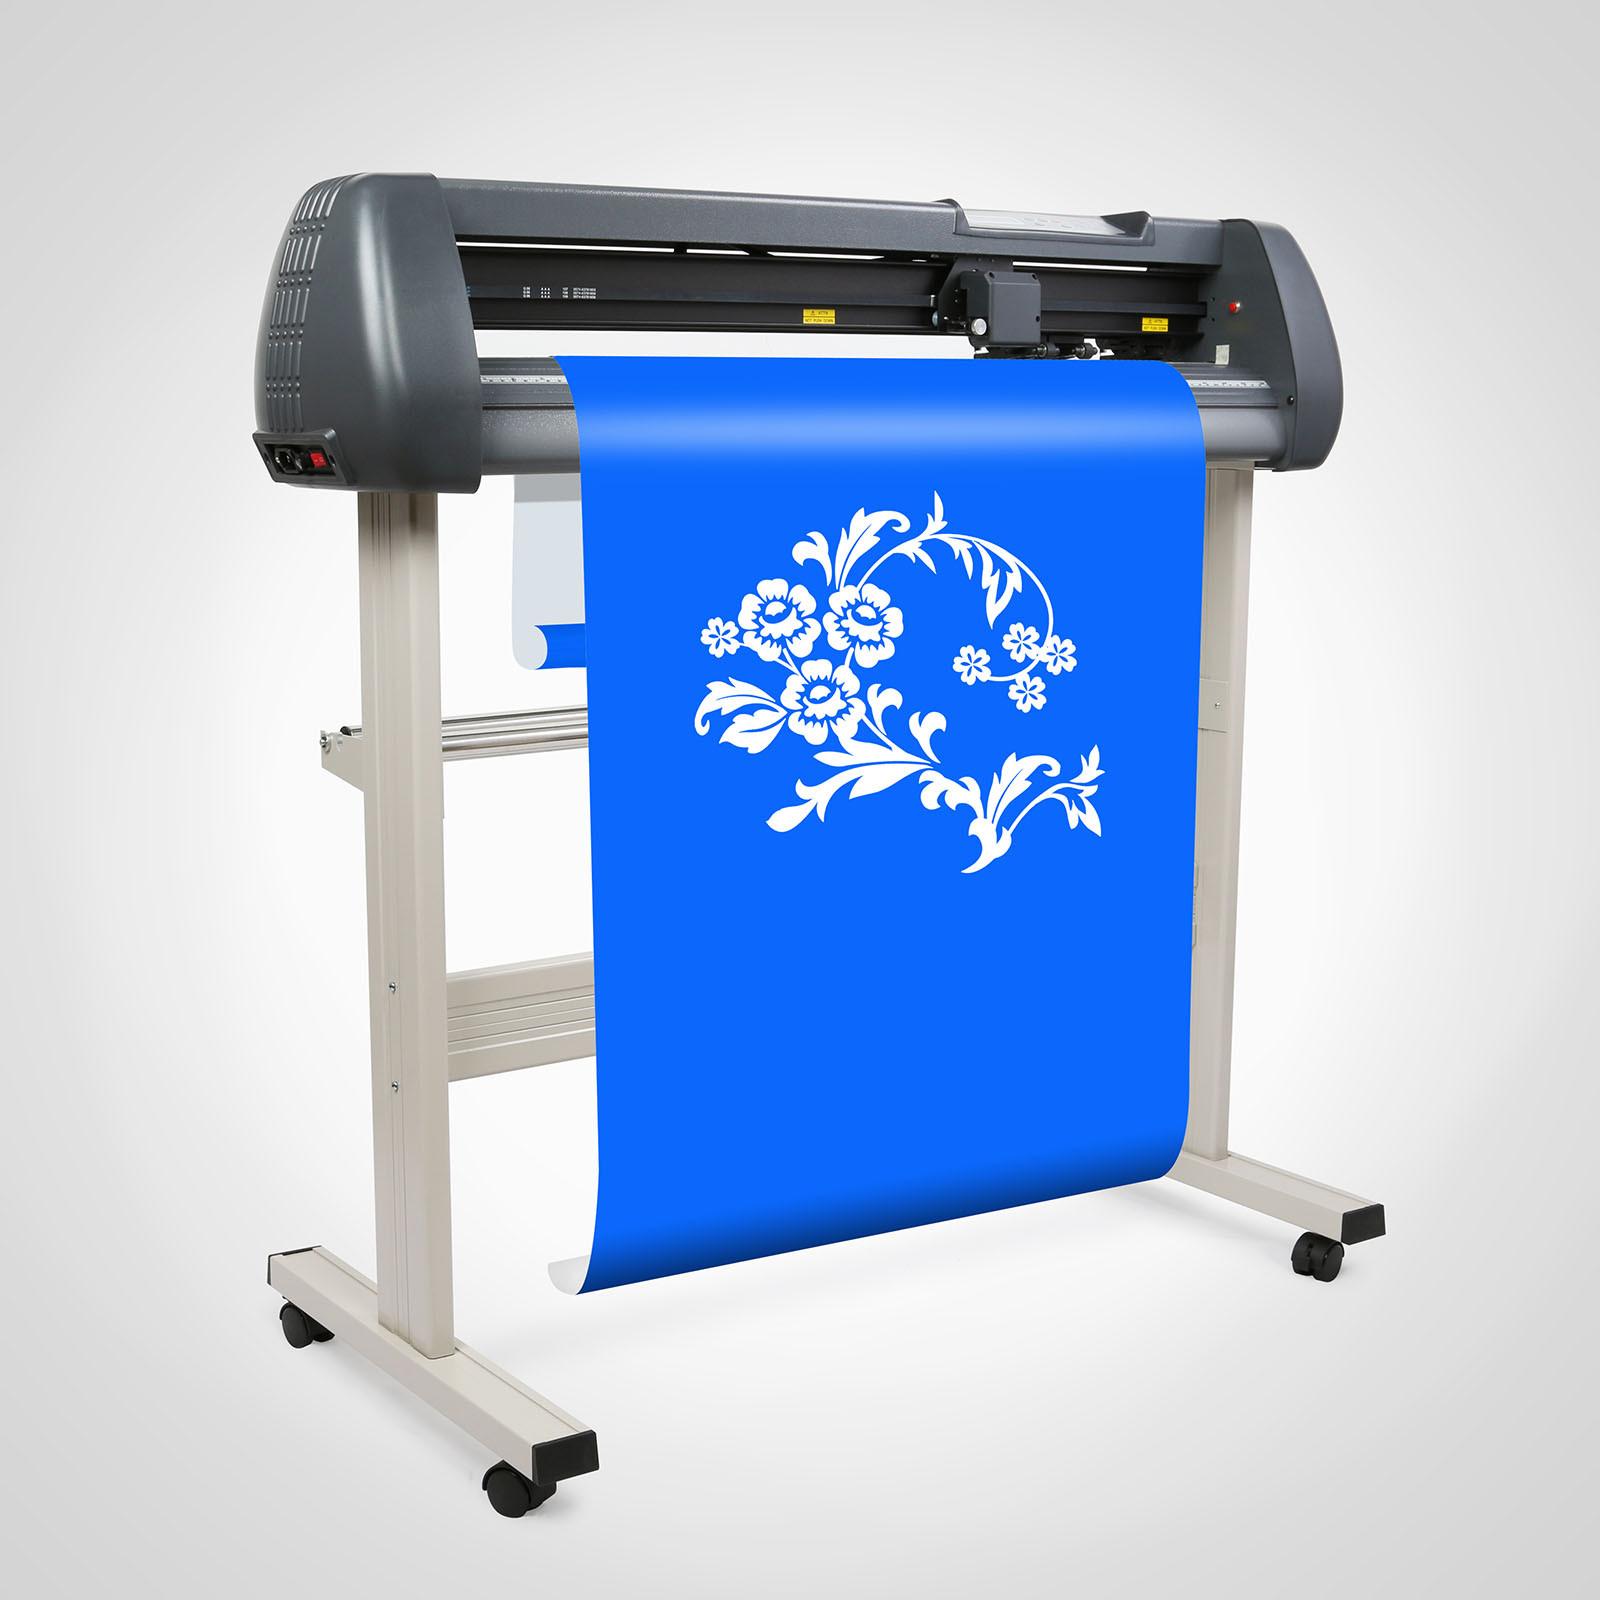 34 vinyl cutter cutting plotter w artcut software sticker design cut ebay. Black Bedroom Furniture Sets. Home Design Ideas